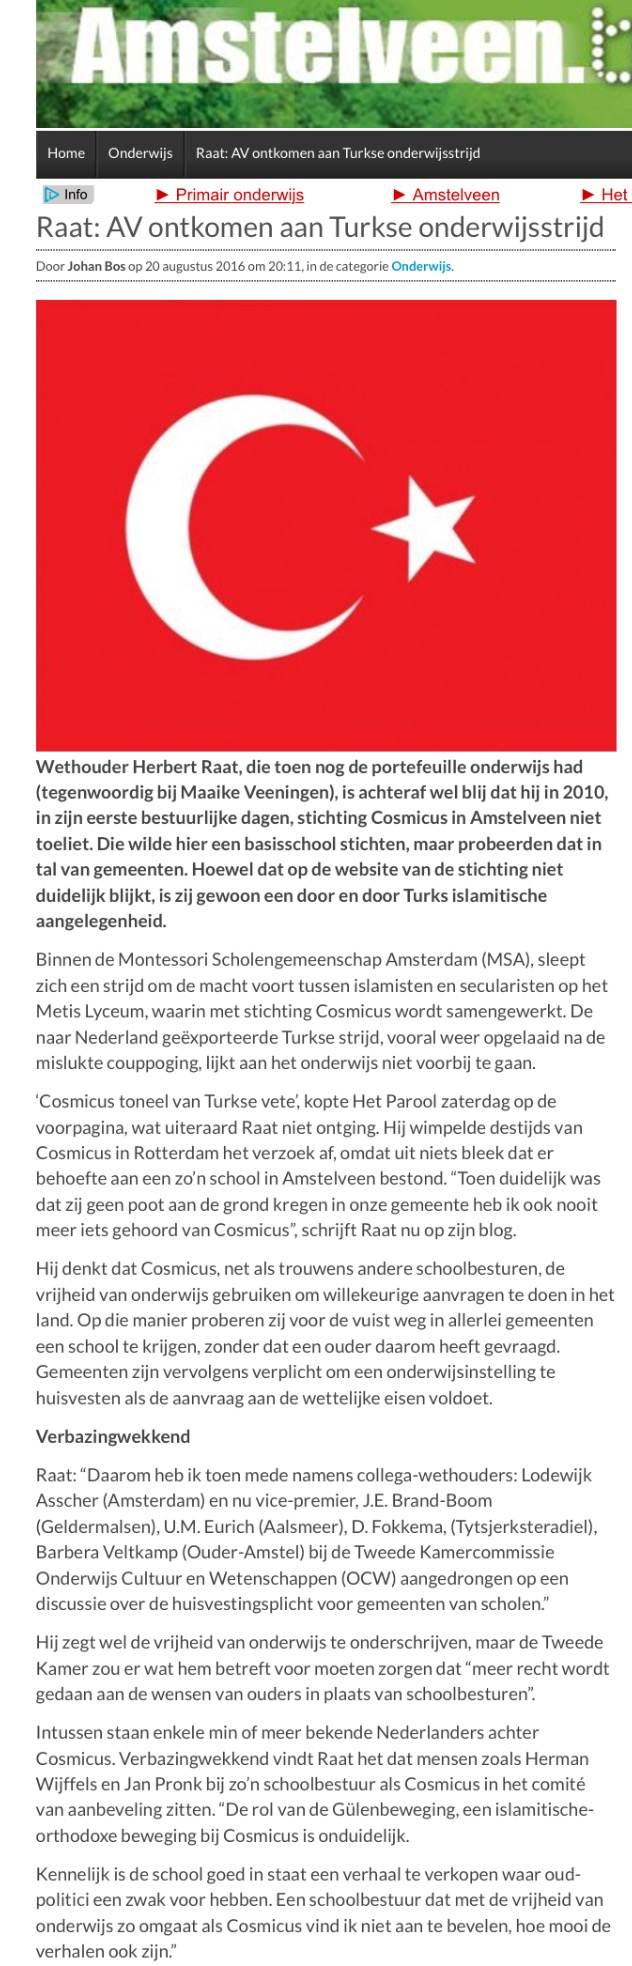 2016-20 augustus Amstelveenblog.nl Cosmicus Amstelveen